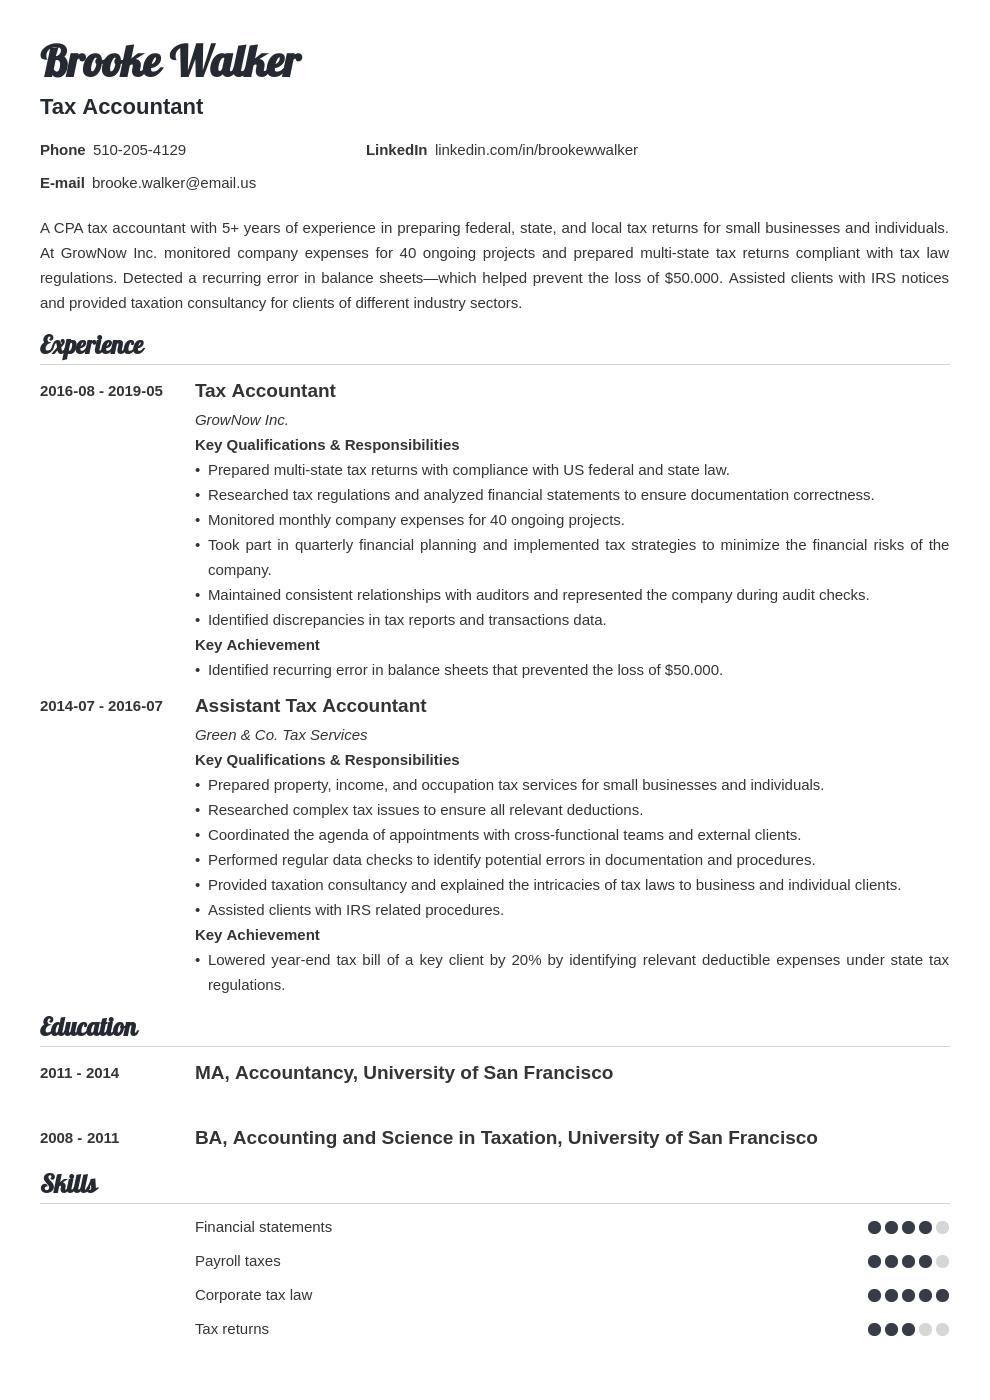 Tax Accountant Resume Example Template Valera Accountant Resume Tax Accountant Job Resume Examples